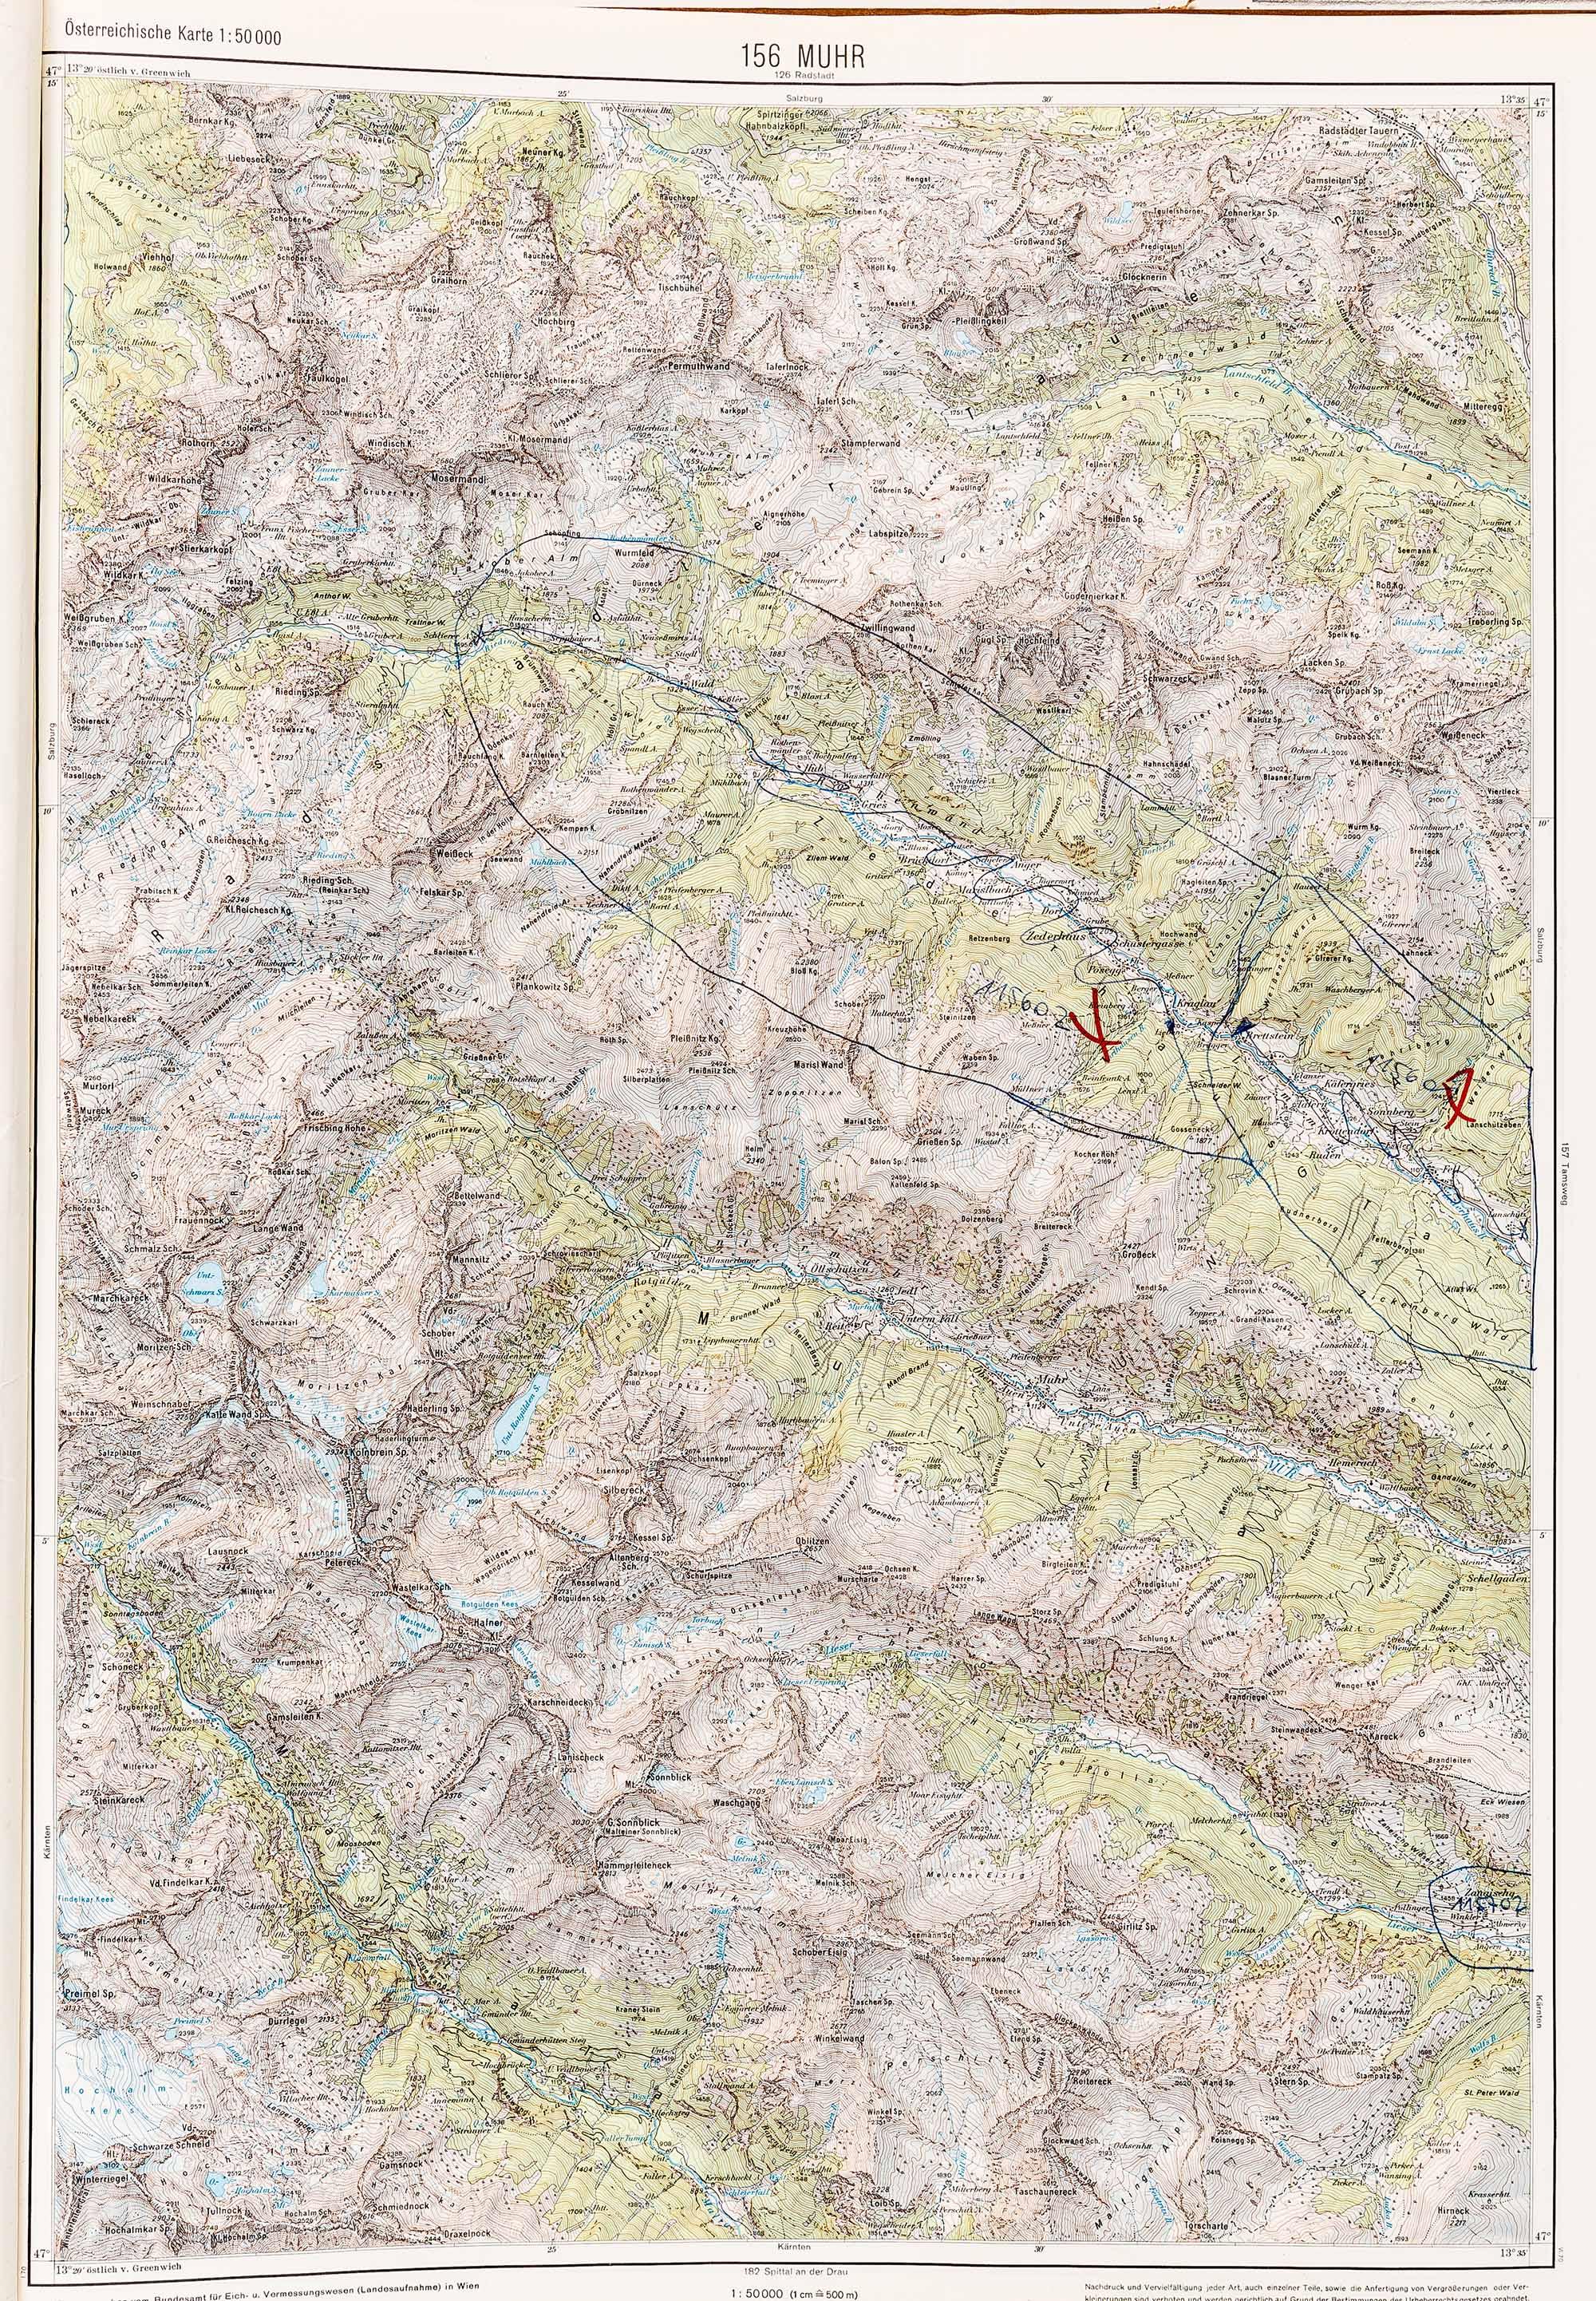 1979-1982 Karte 156